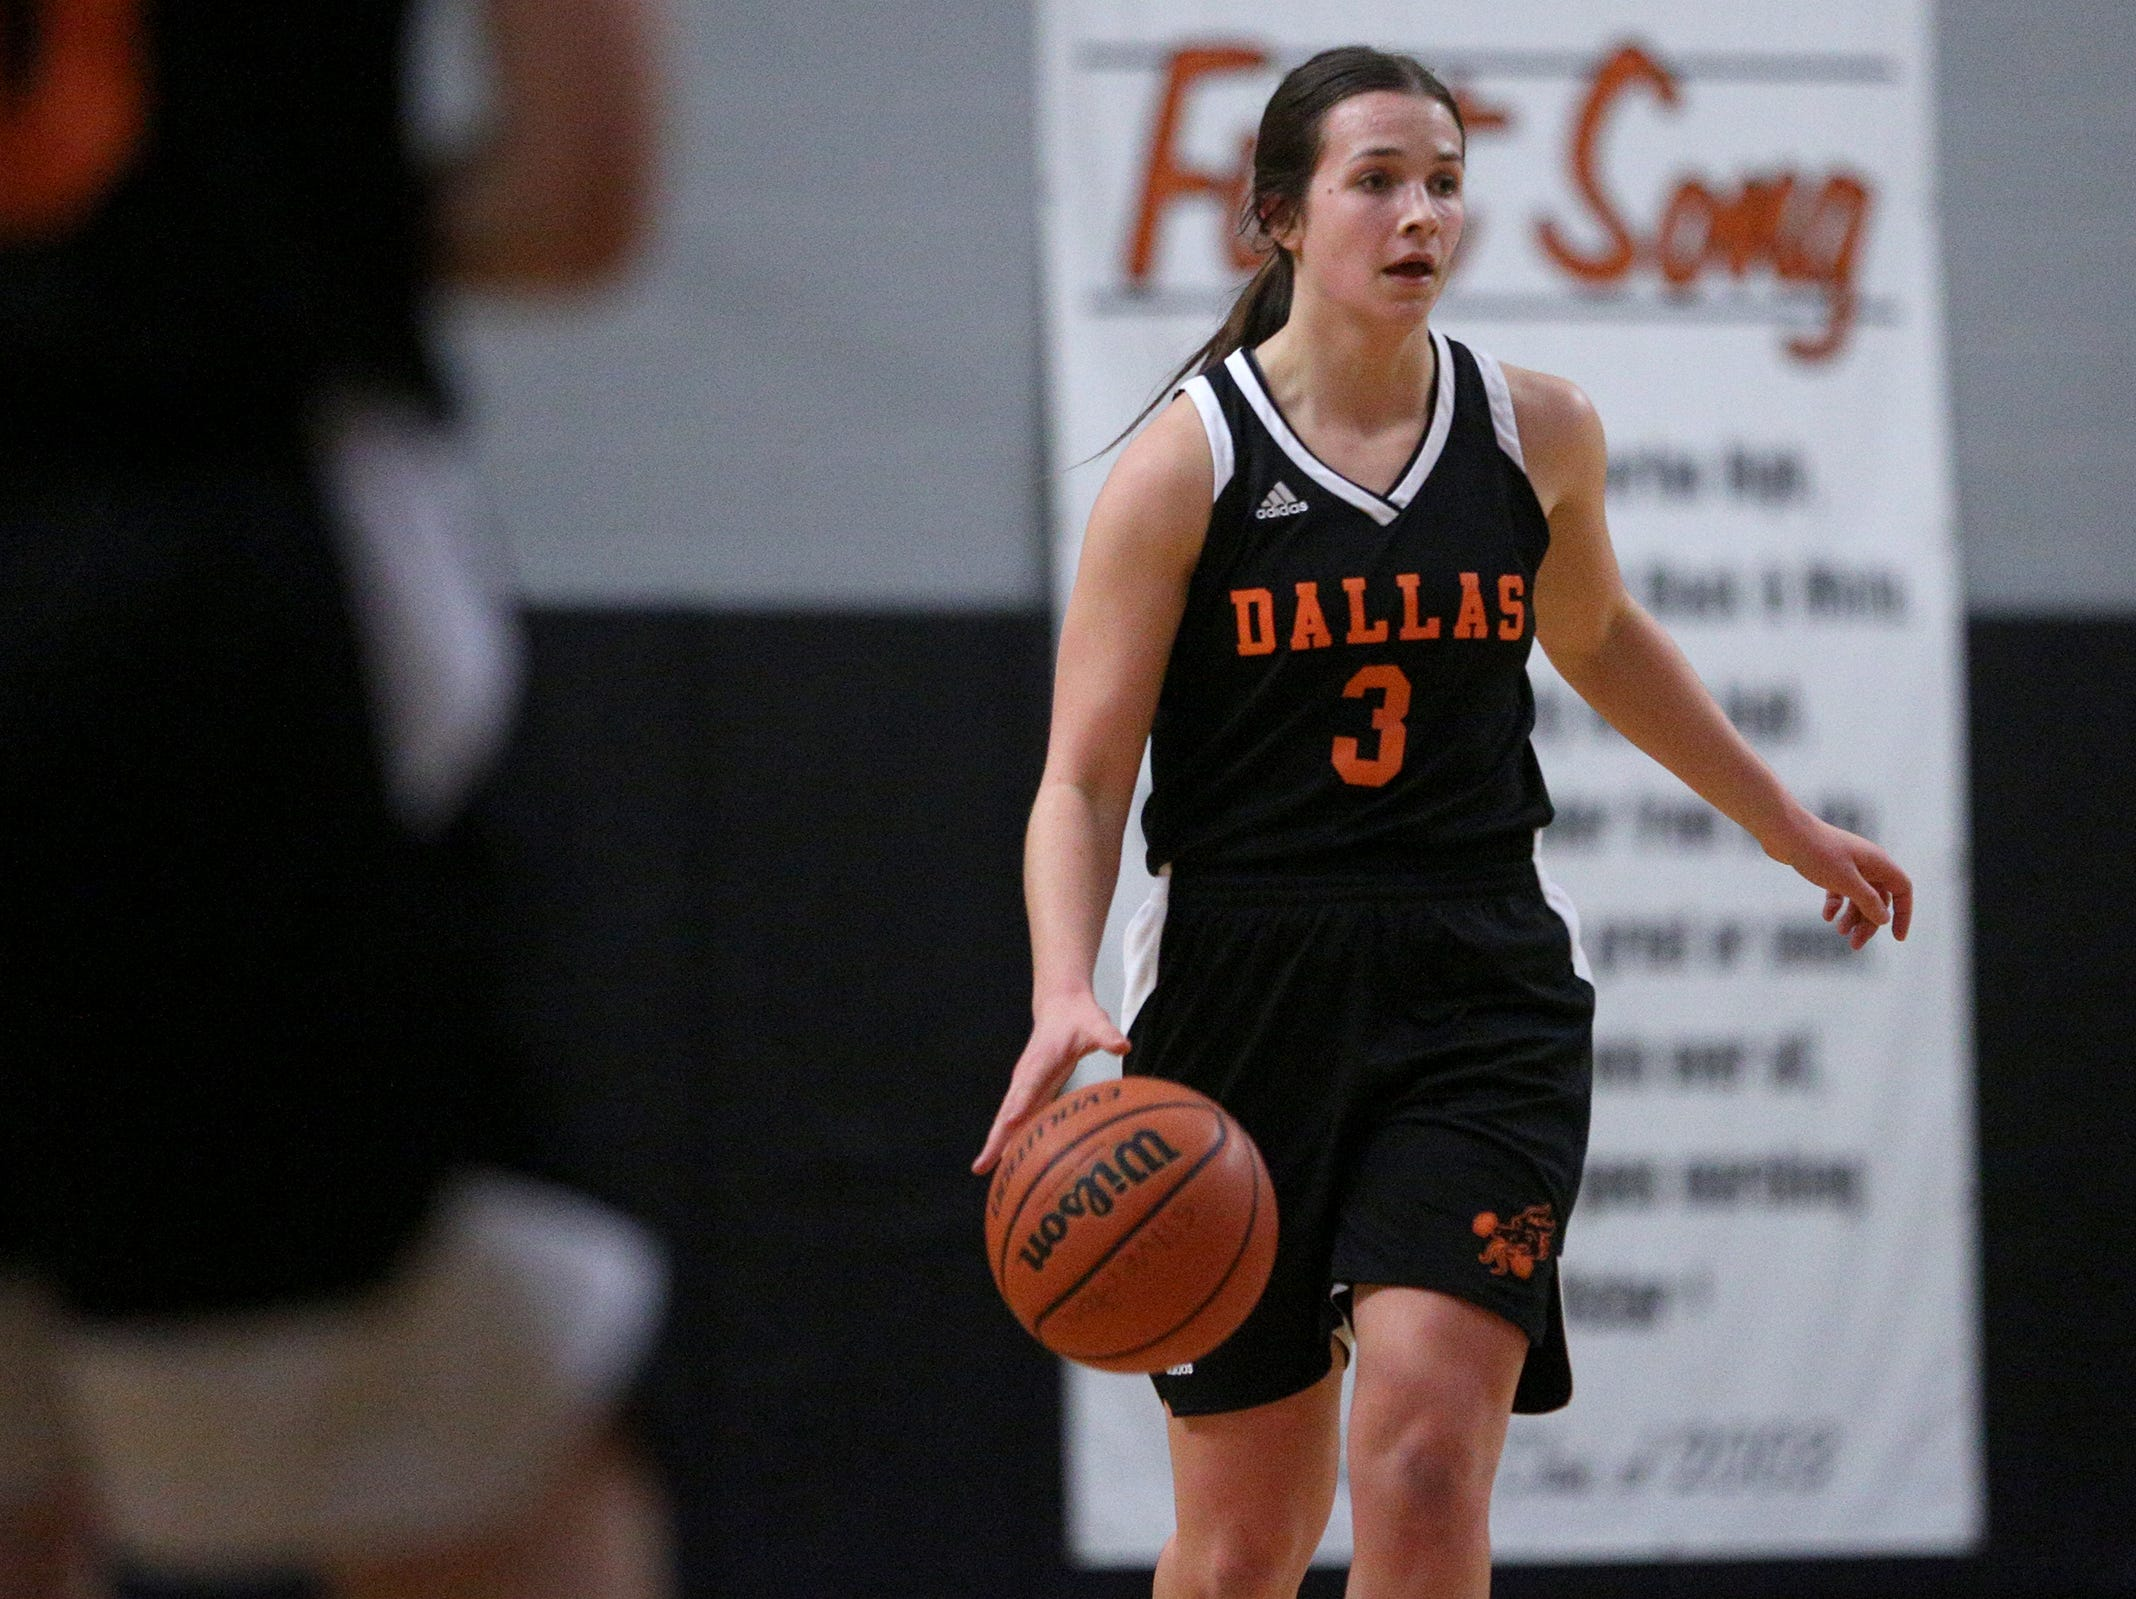 Dallas' Emma Classen (3) looks to make a pass during the Dallas High School vs. Silverton High School girls basketball game in Silverton on Tuesday, Dec. 8, 2019.